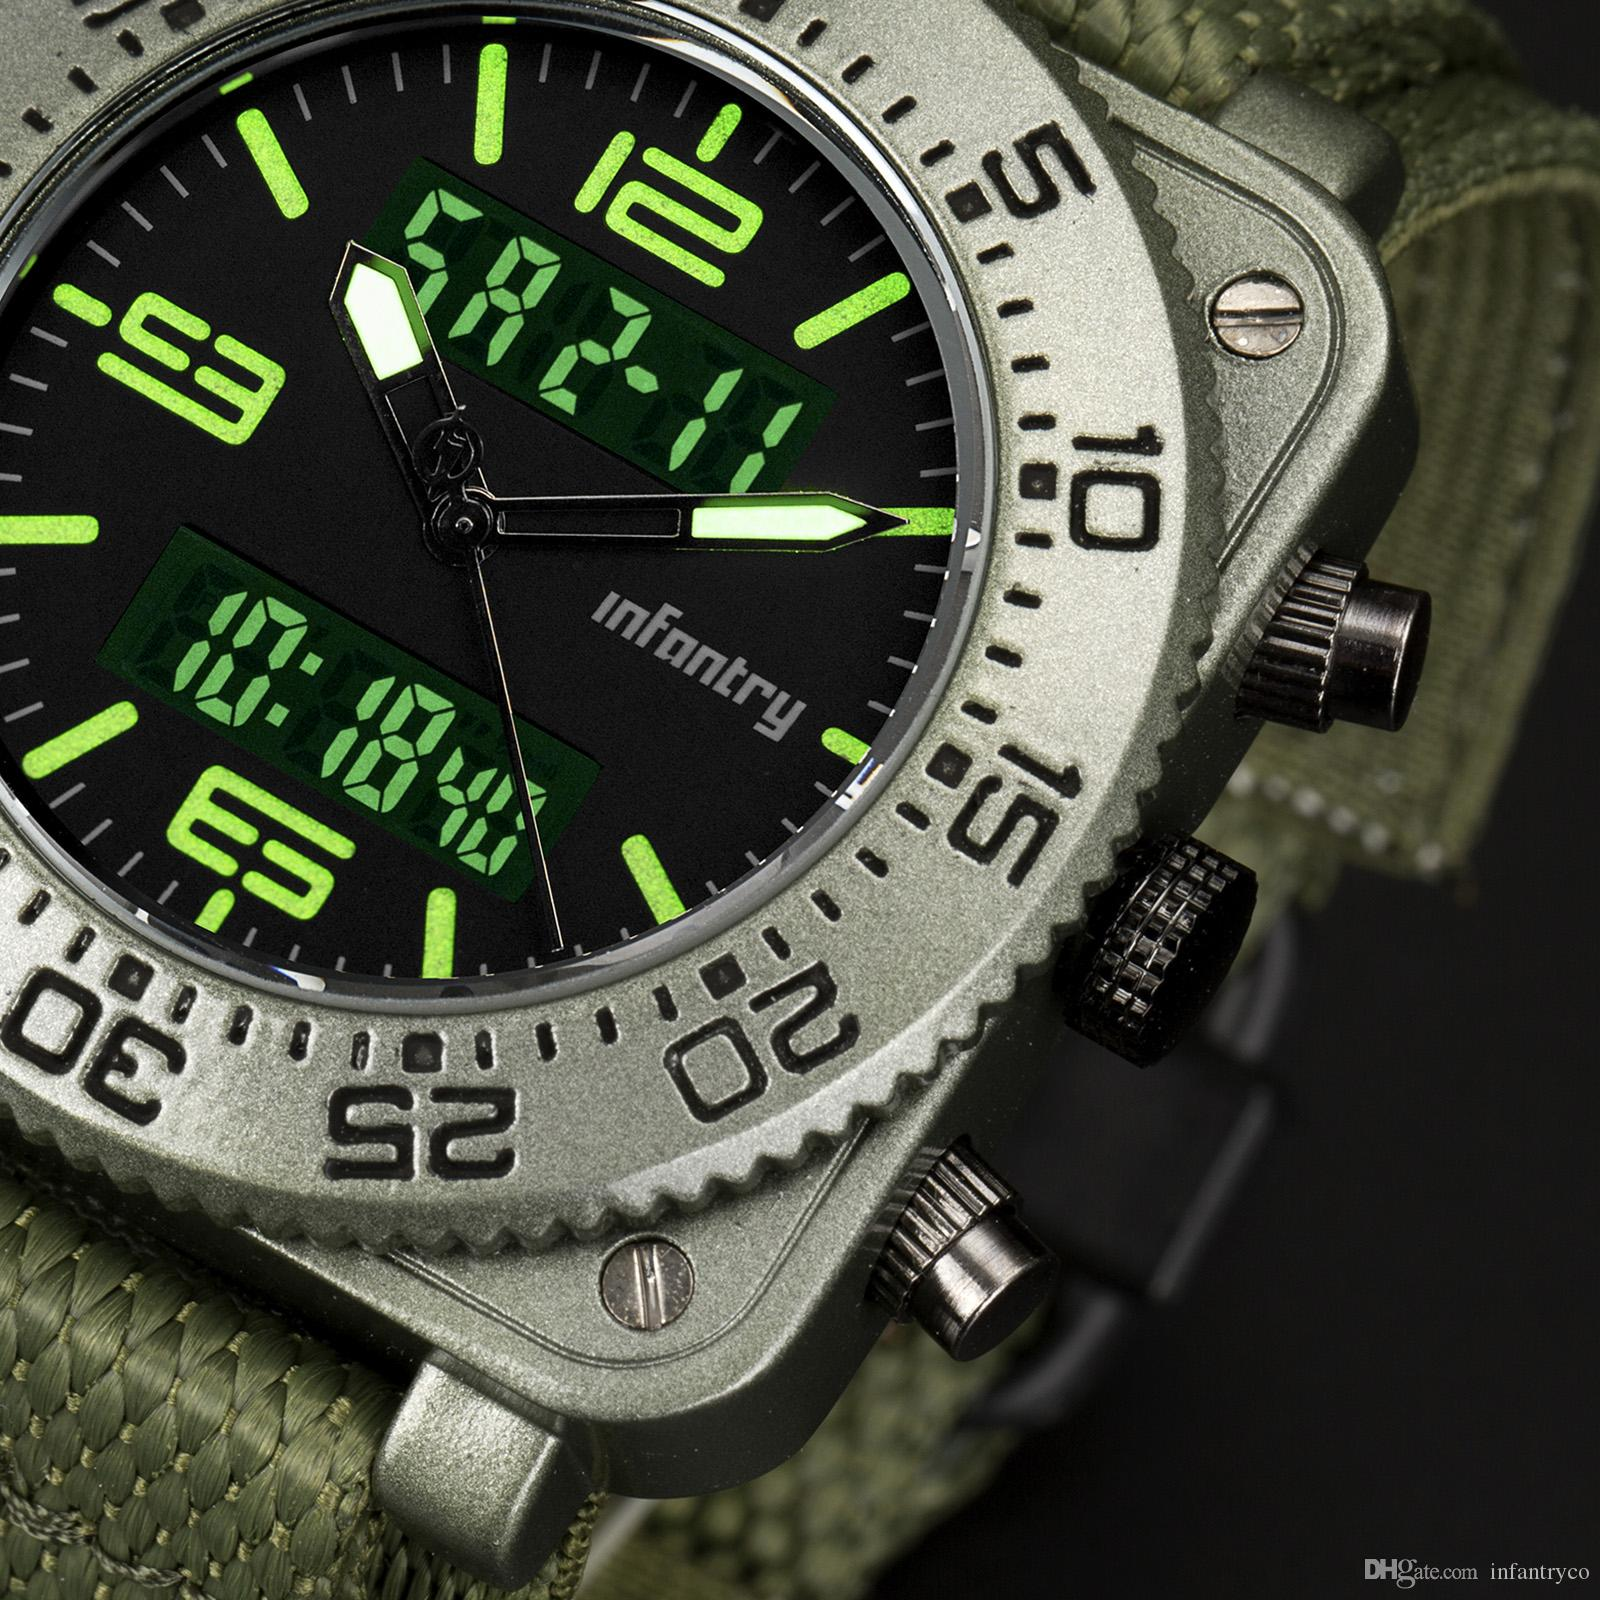 5cf63430f0a Compre INFANTARIA Famosa Marca Mens LED Digital Relógio De Pulso De Quartzo  Moda Esporte Relógios Militar Relógio De Pulso Cronógrafo Nylon Strap  Montre ...